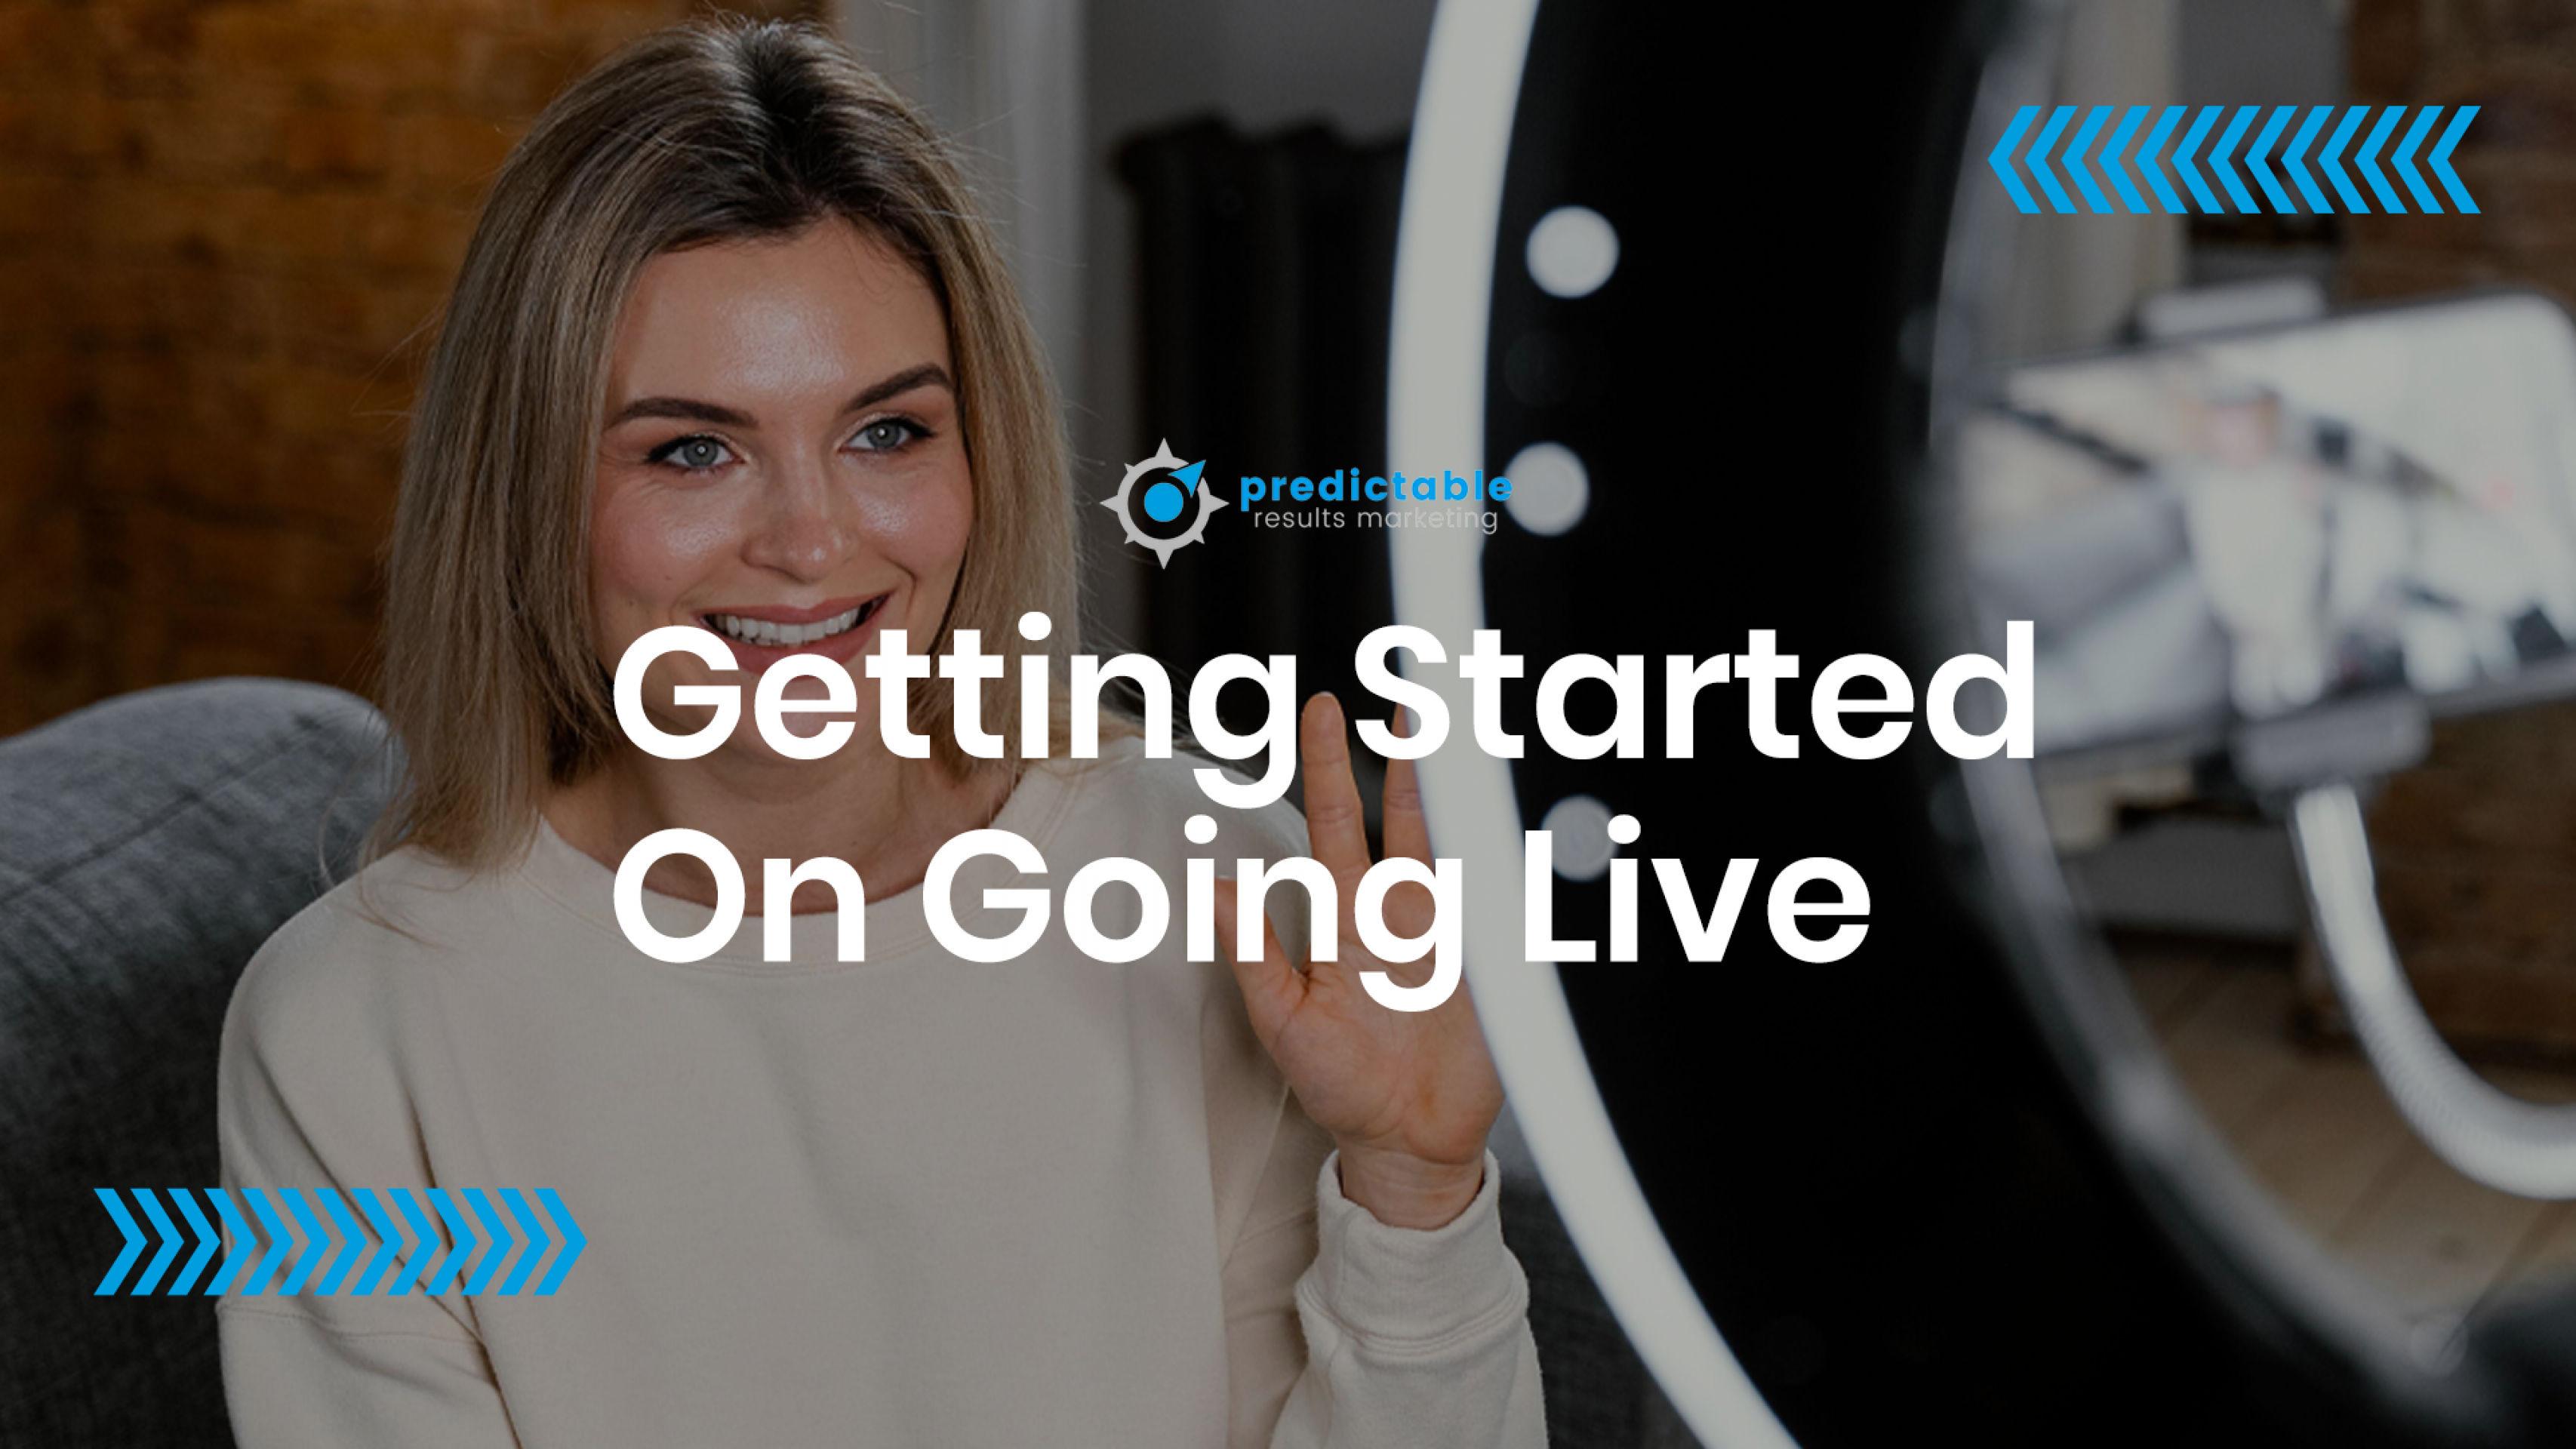 Getting Started Going Live on Social Media Platforms